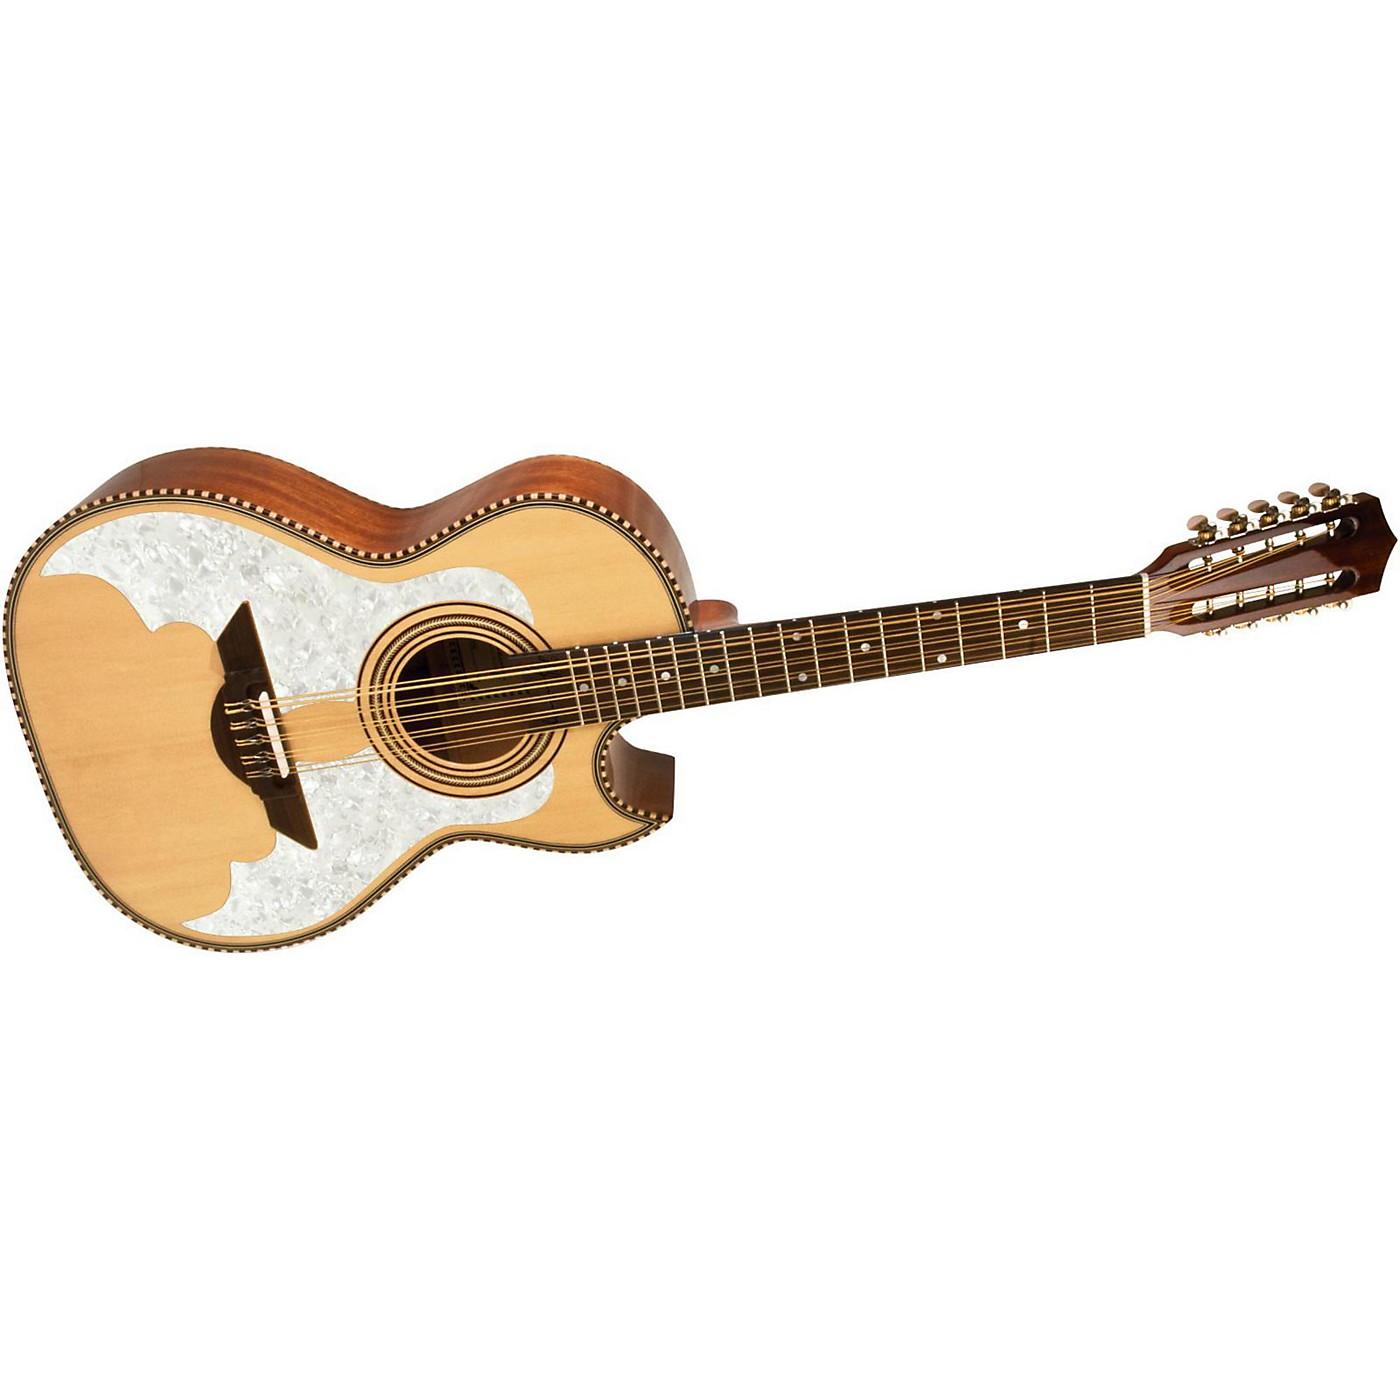 H. Jimenez LBQ3E El Murcielago (The Bat) Full Body Bajo Quinto Acoustic-Electric Guitar thumbnail